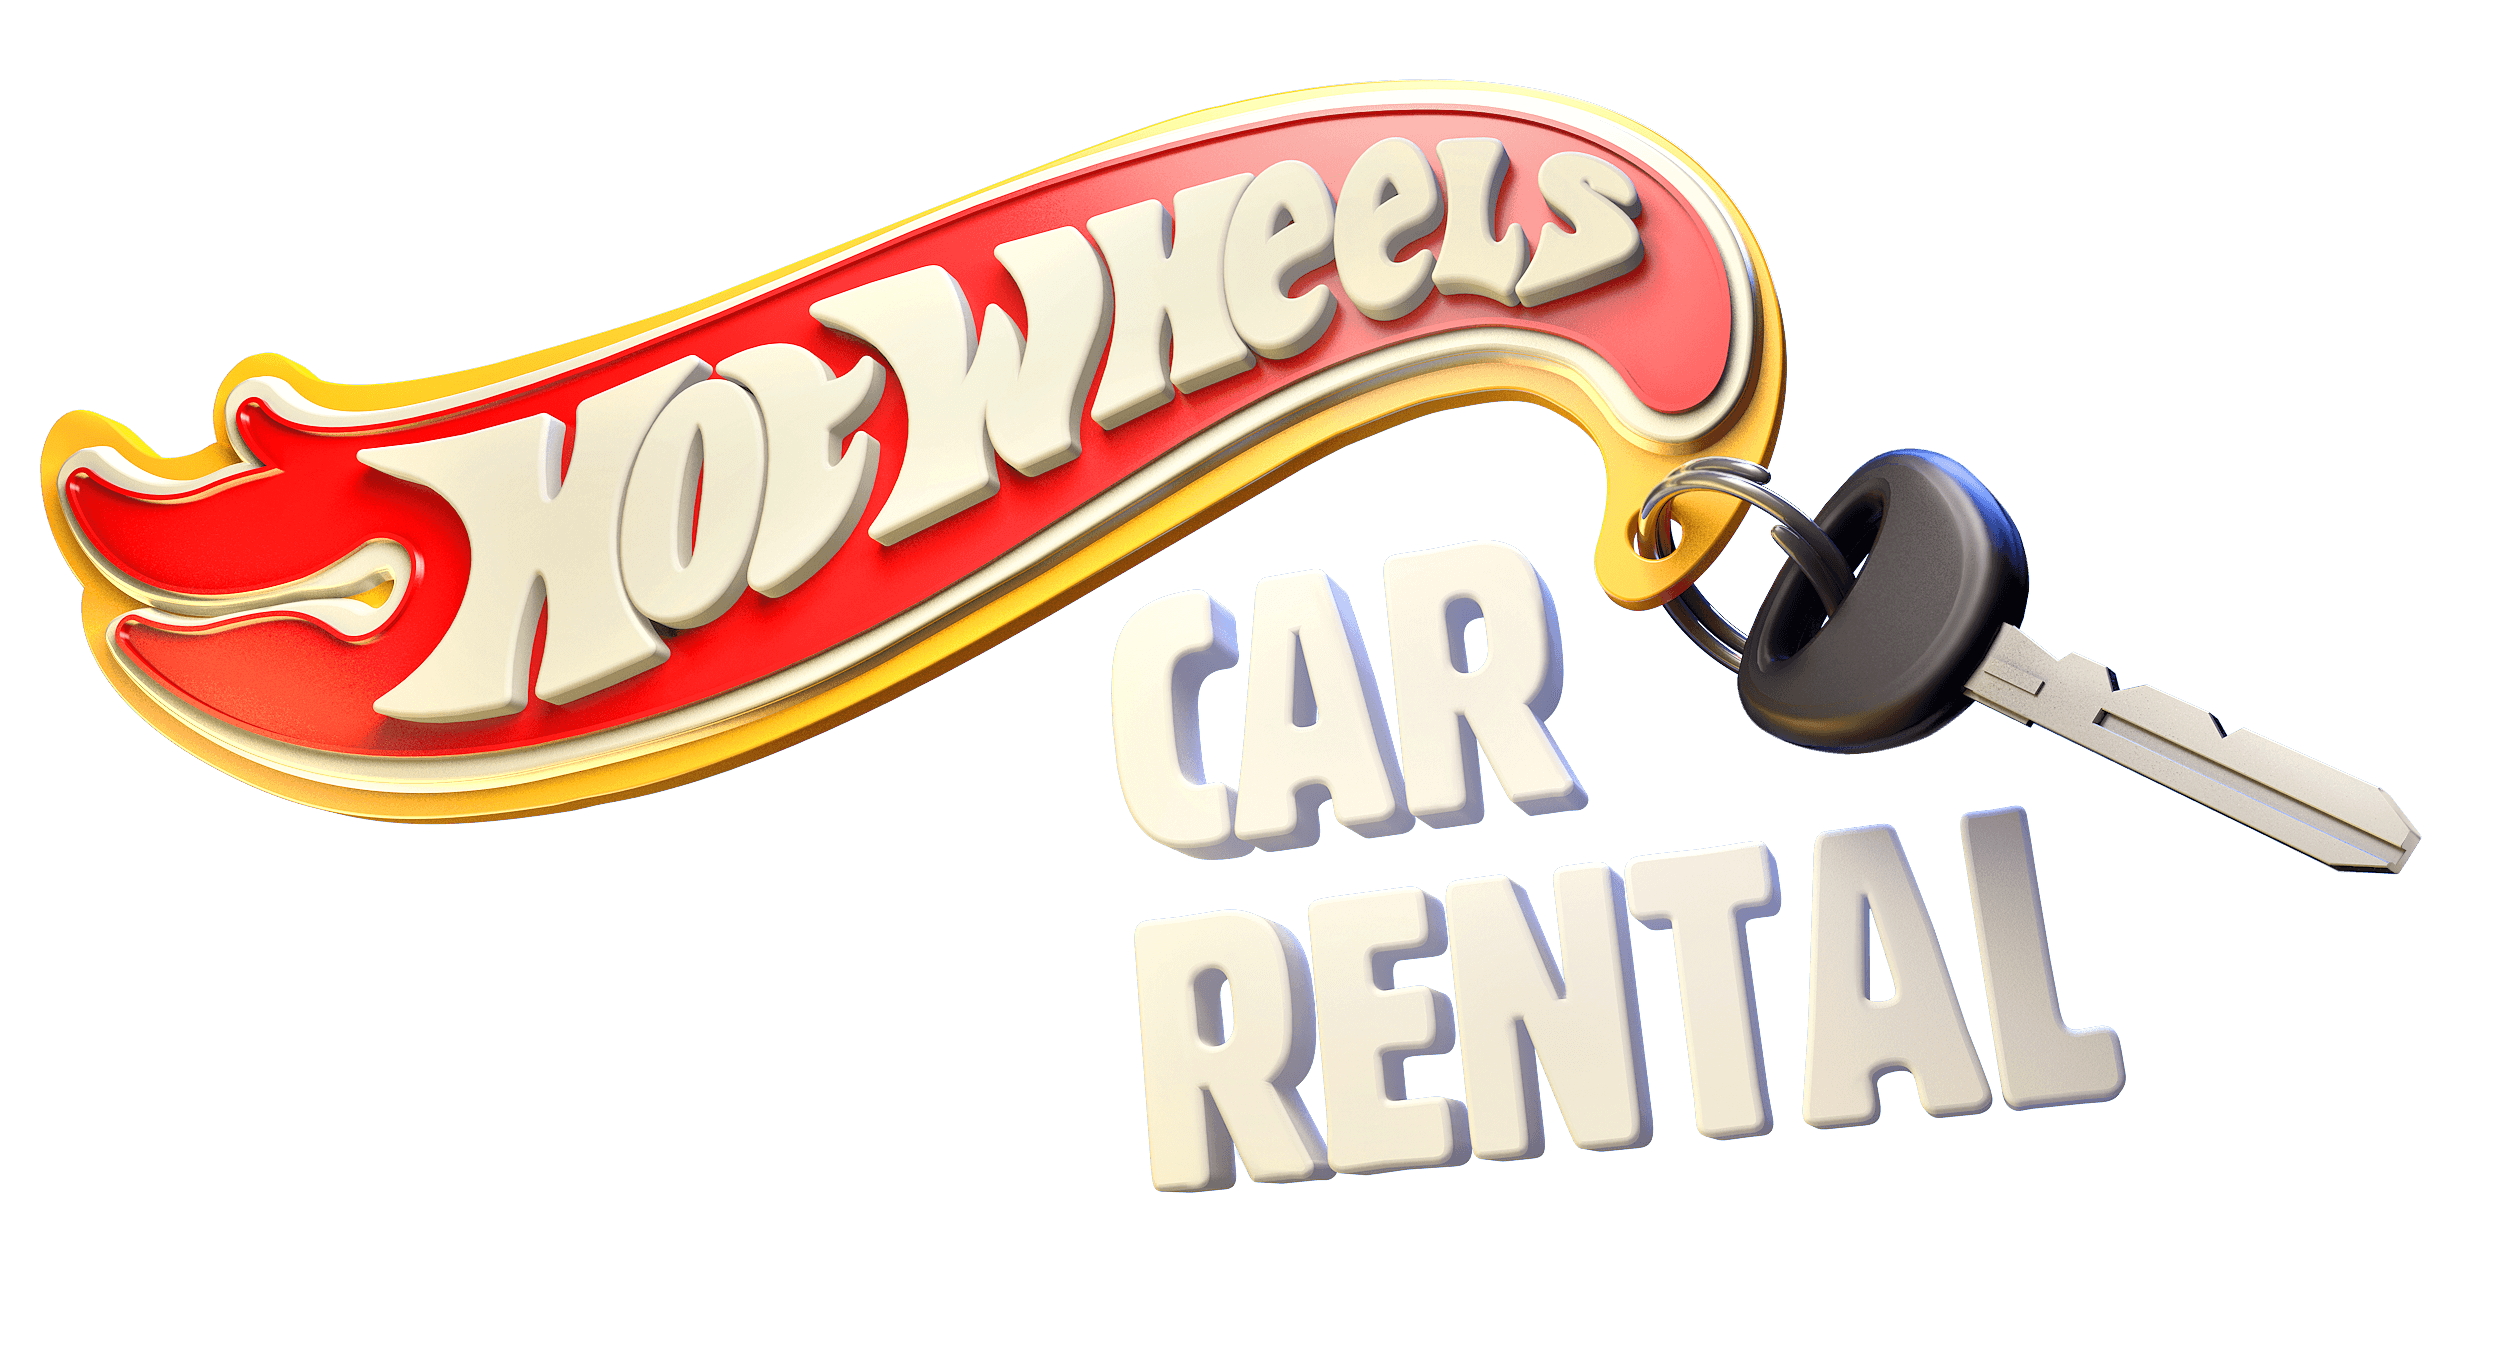 Hot Whells x Europcar – Kids Car Rental